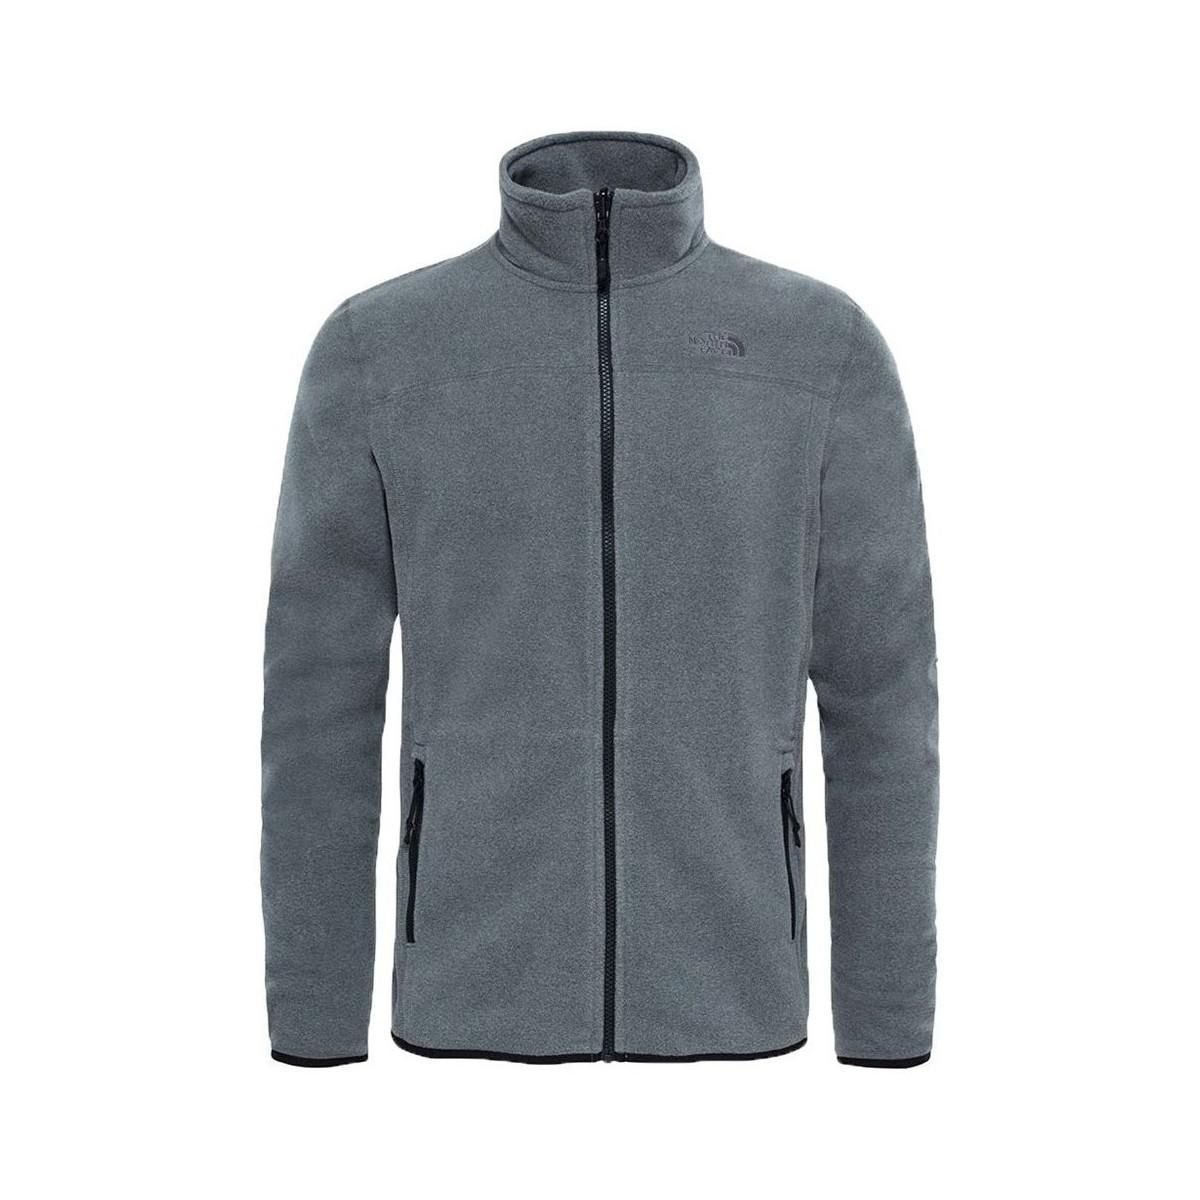 38c1e3a89 The North Face M 100 Glacier Men's Fleece Jacket In Grey in Gray for ...